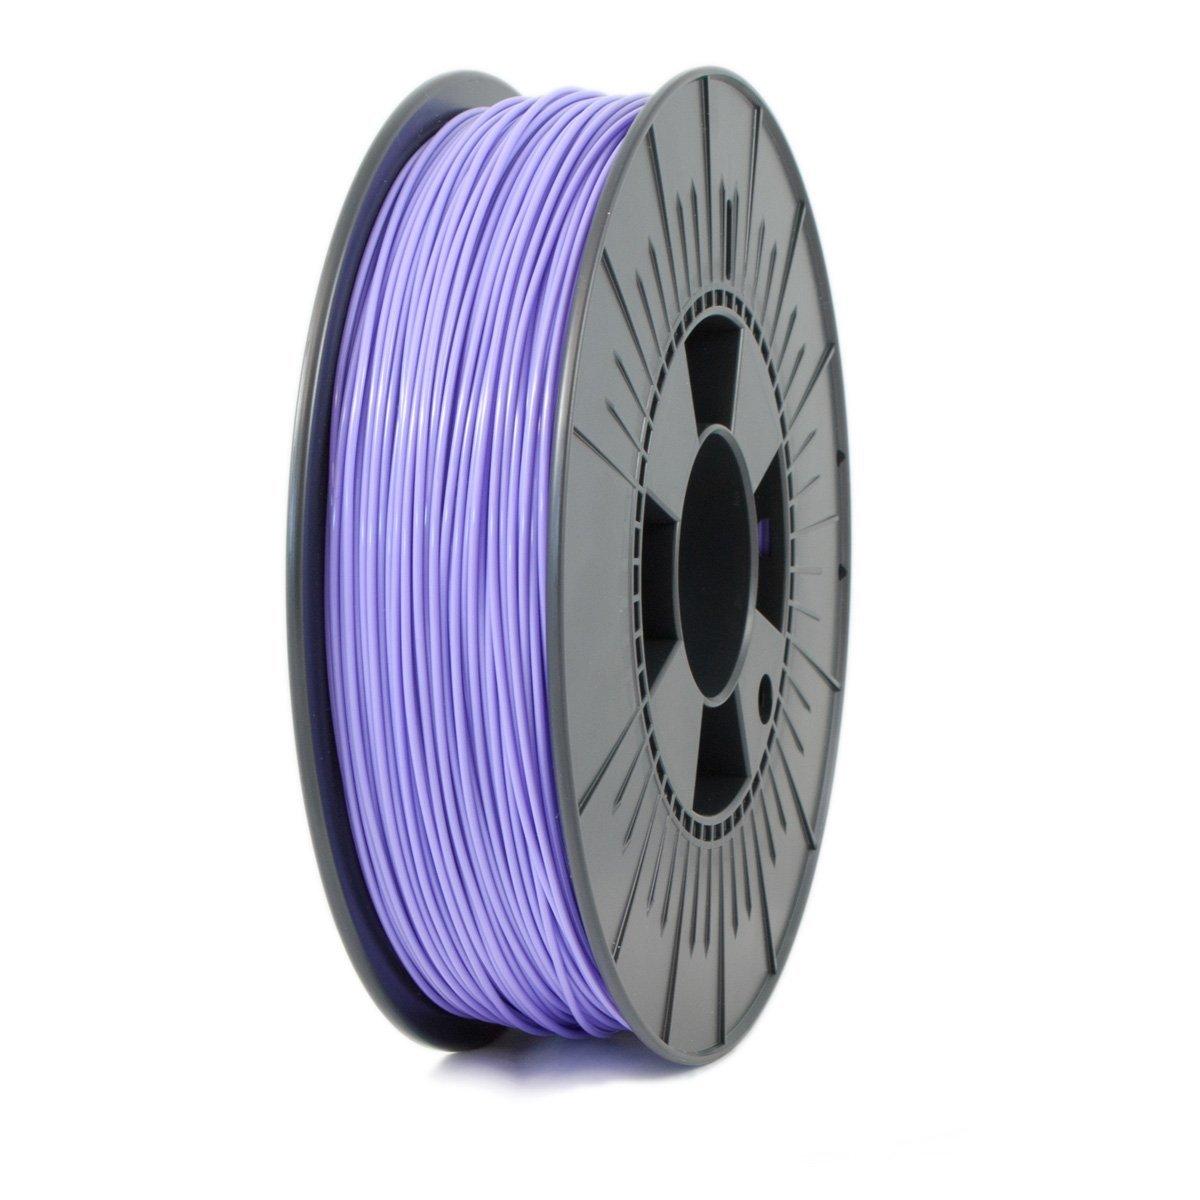 Ice Filaments  Perky Purple PLA 2.85 mm